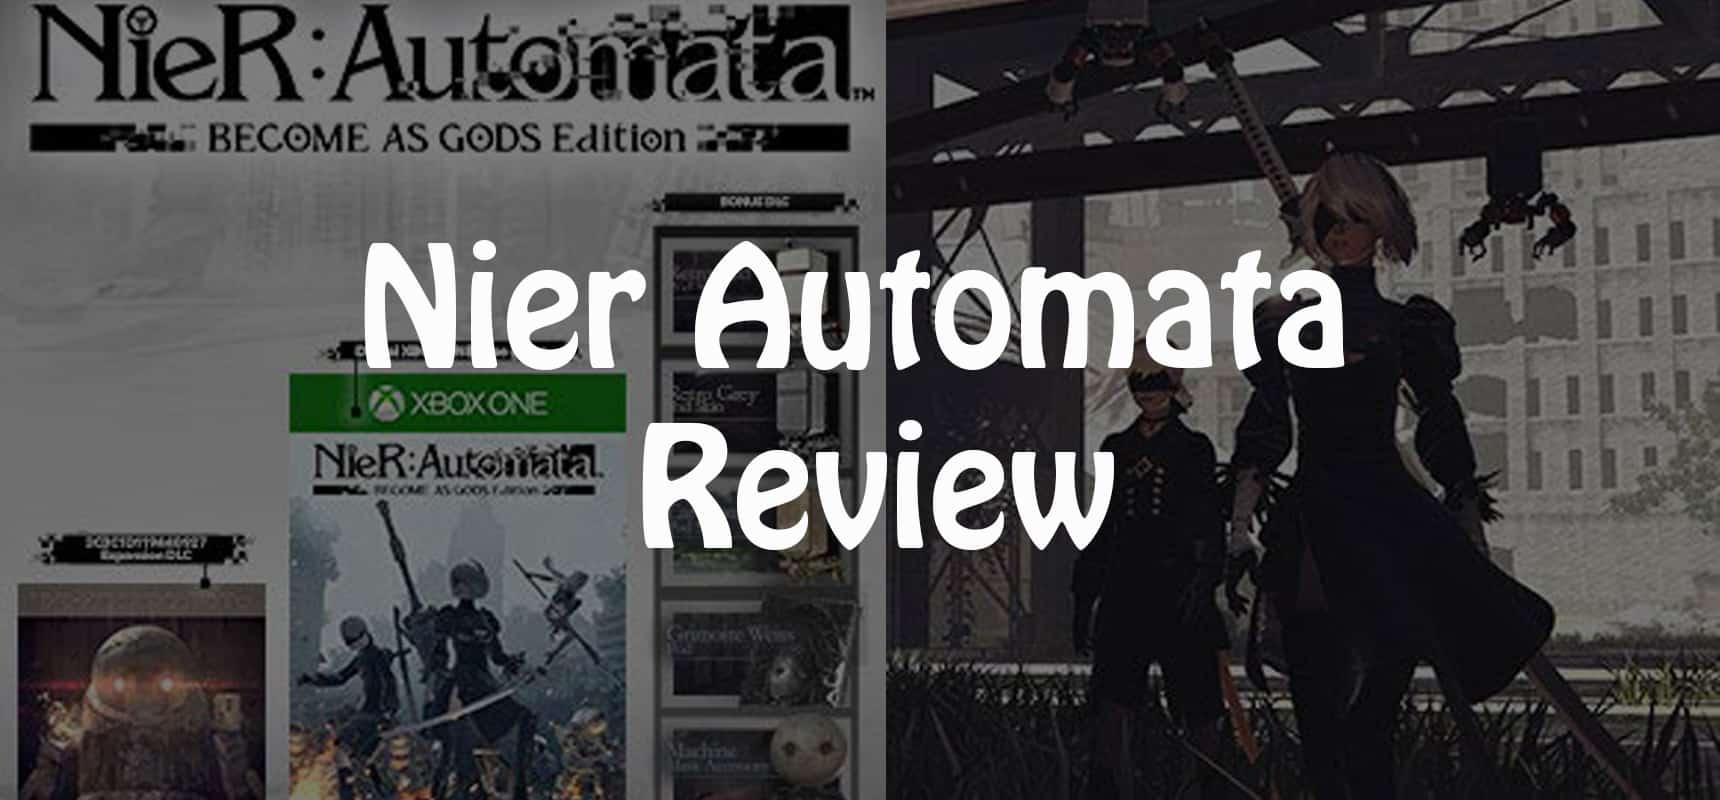 Nier Automata Reviews